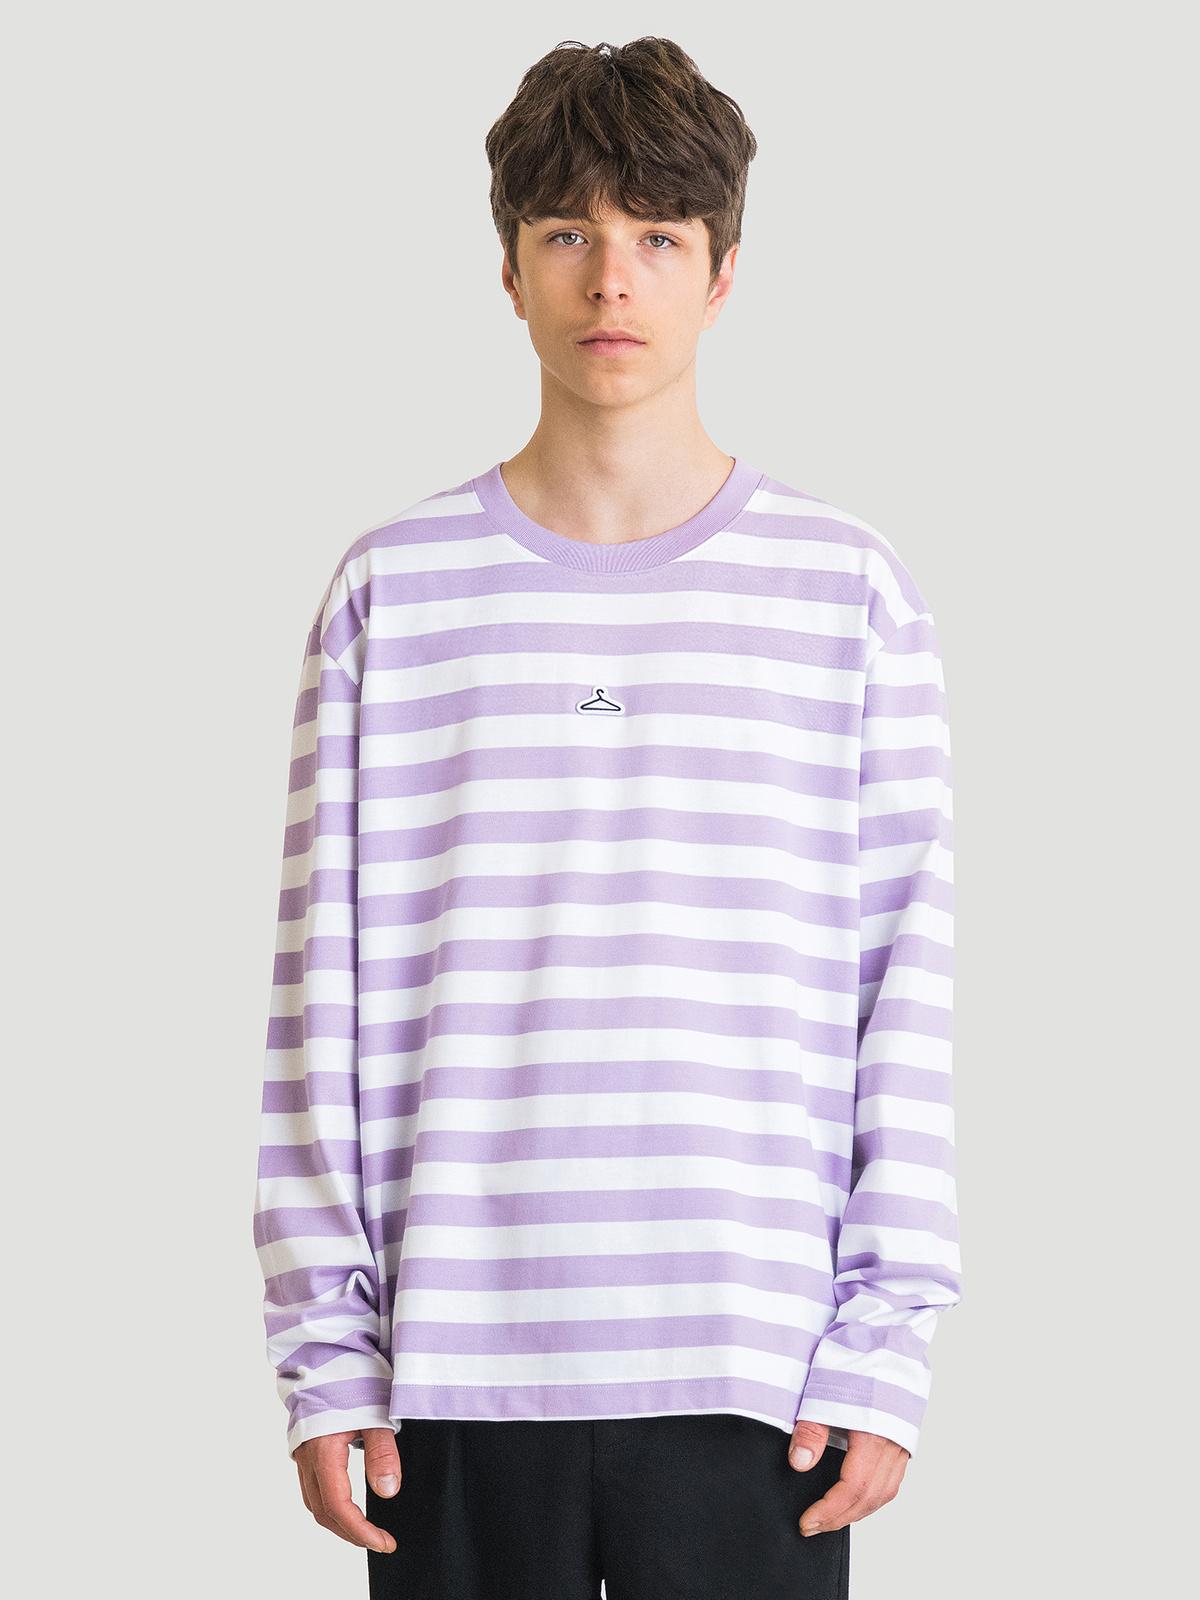 Hanger Striped Longsleeve Lilac White 0